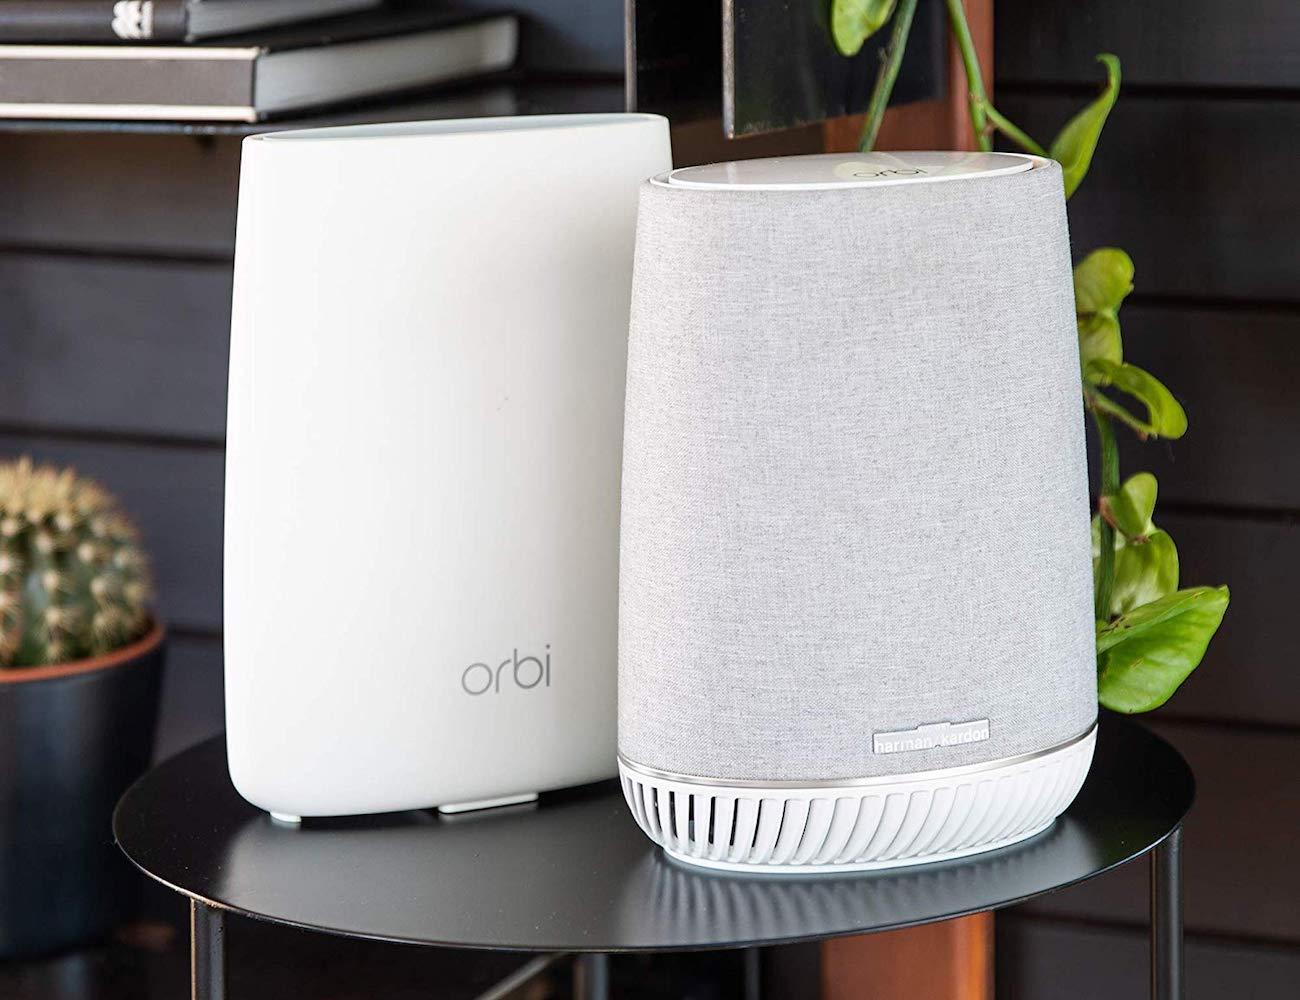 NETGEAR Orbi Voice Mesh Wi-Fi System